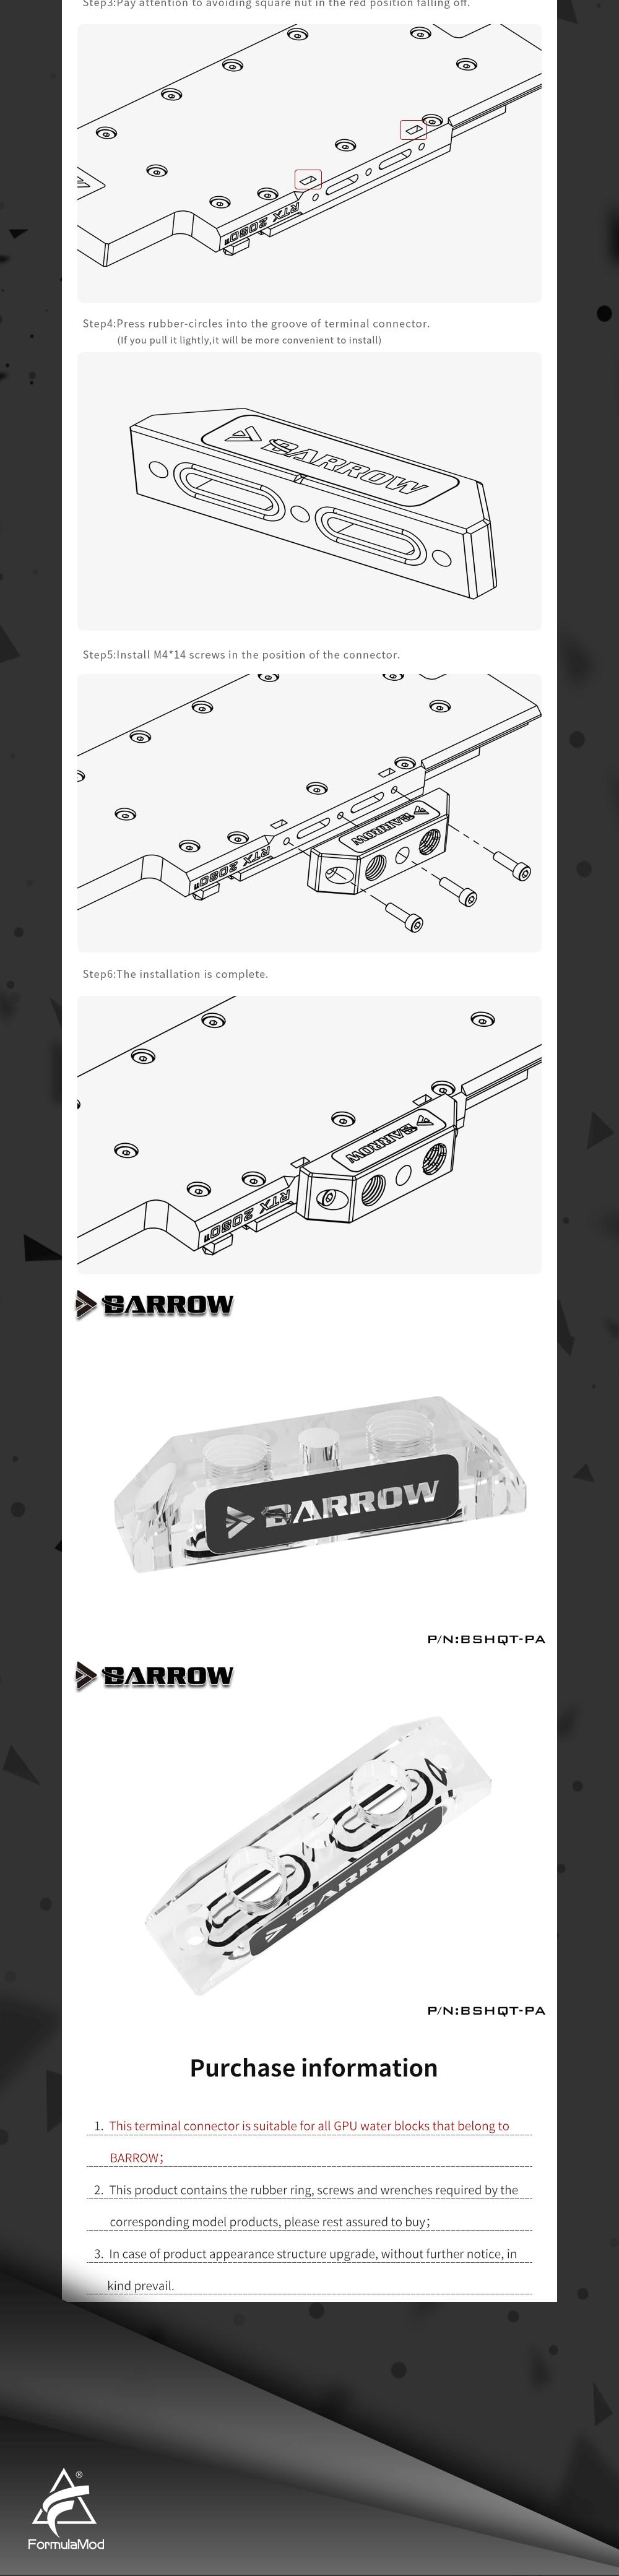 Barrow BSHQT-PA, Multifunctional Acrylic Change Direction Top-Side GPU Block Bridge, For Barrow's GPU Water Block Refit